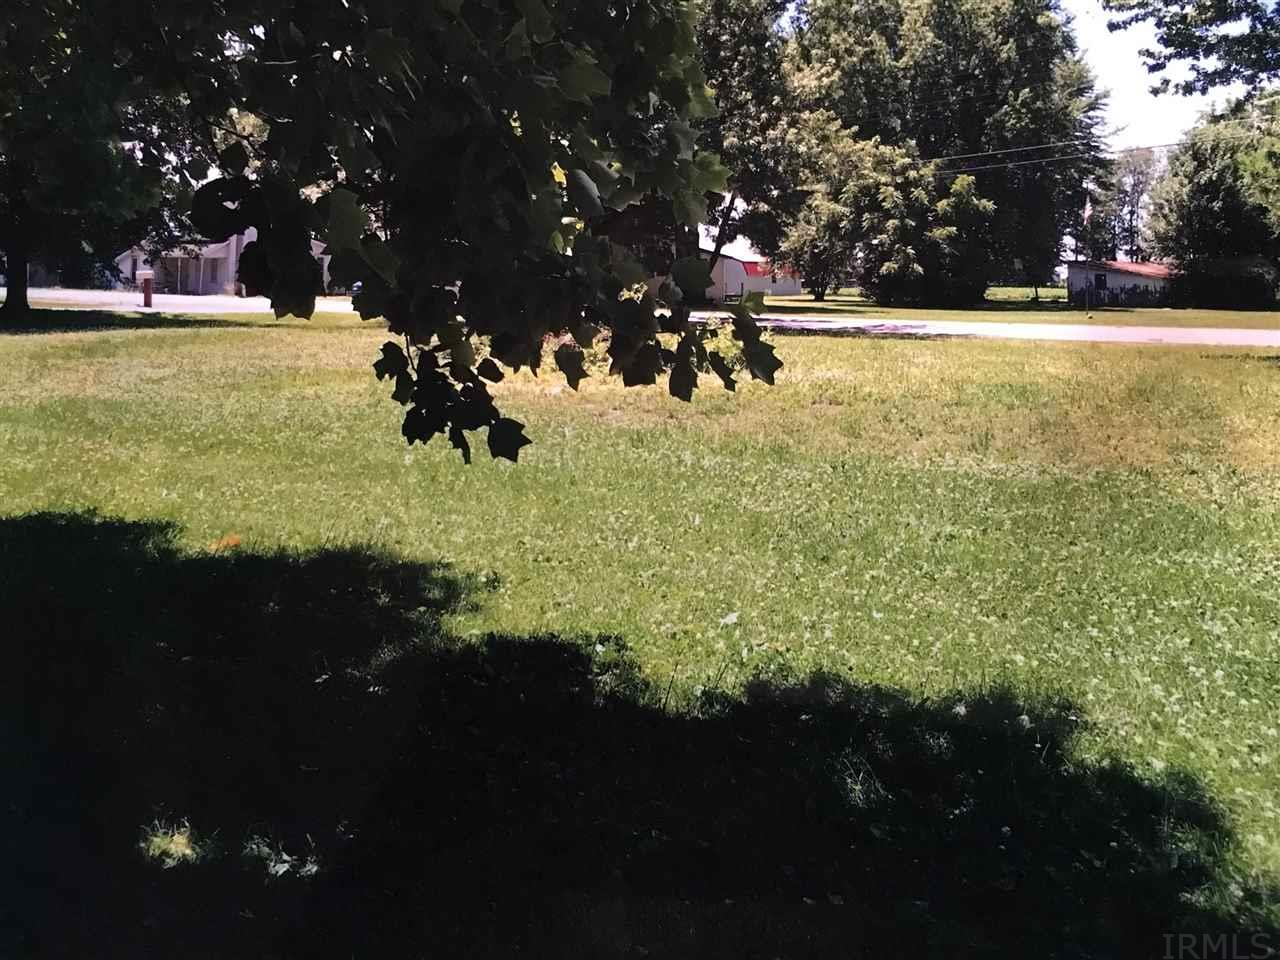 414 W Capitol, Flora, IN 46929